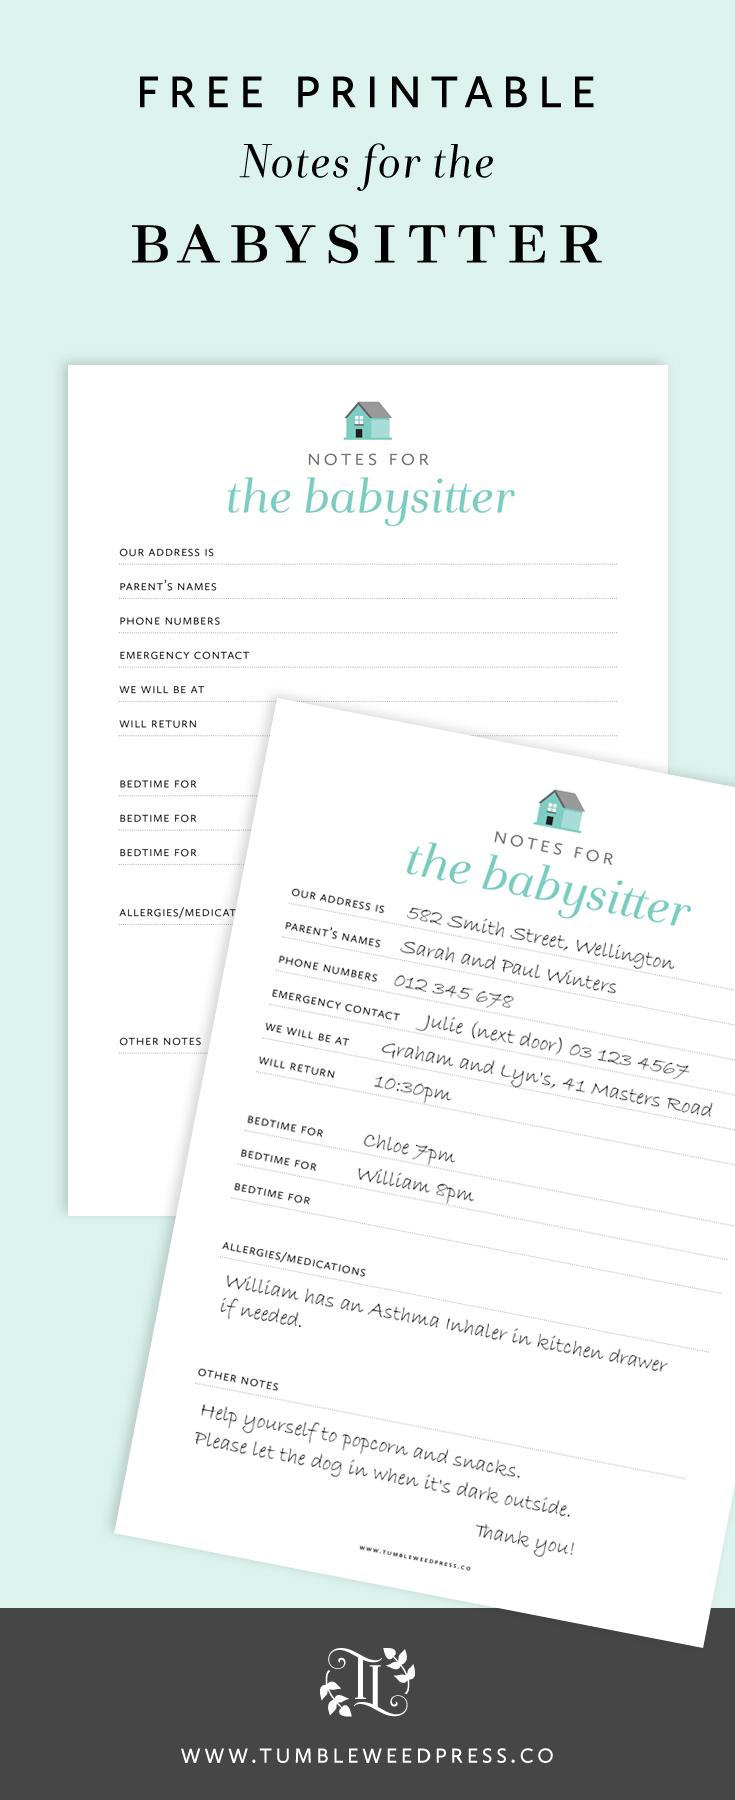 Free Babysitter Notes Printable by TumbleweedPress.Co